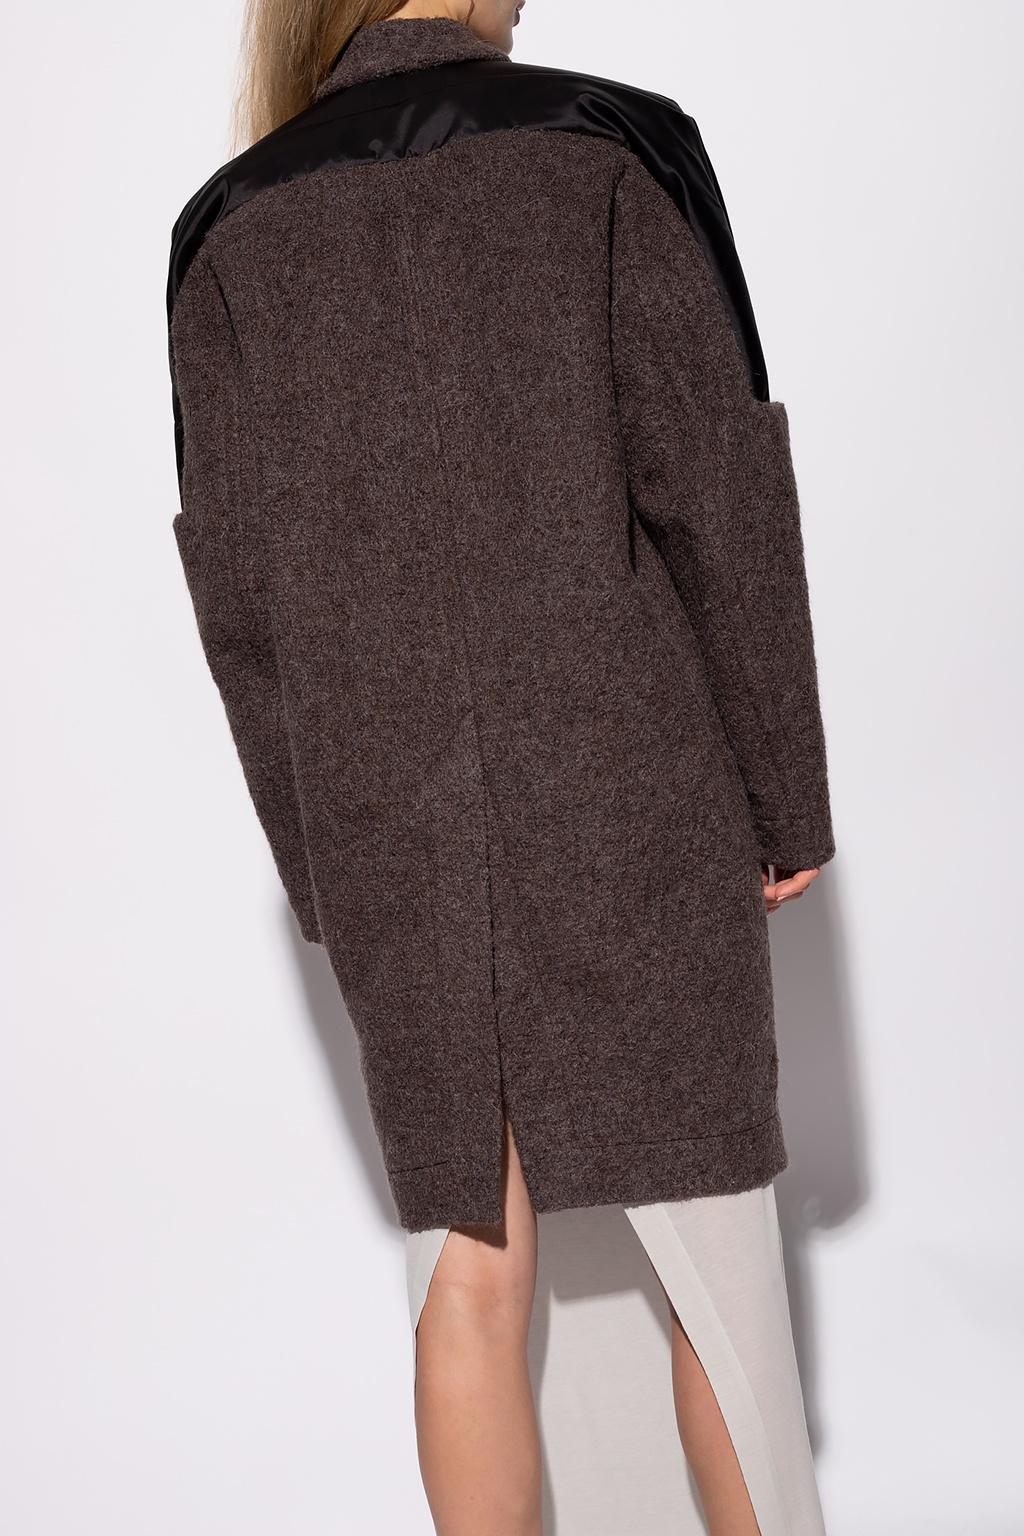 Rick Owens Coat with pockets